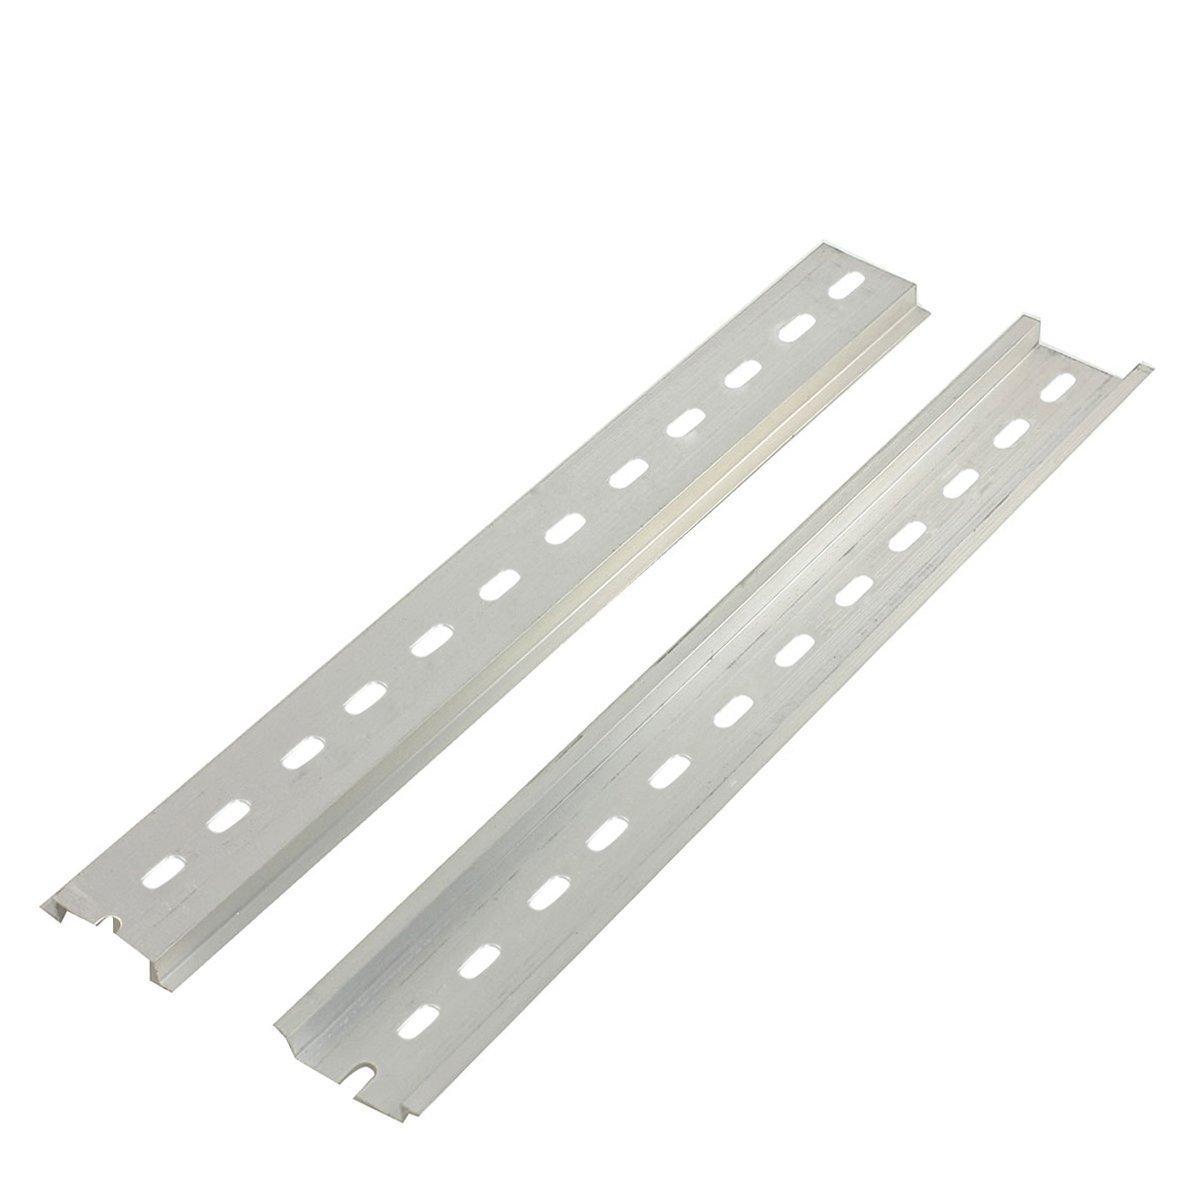 Saim 35/mm ancho con ranuras dise/ño aluminio carril de montaje DIN 250/mm 9.8/ LS12240000118